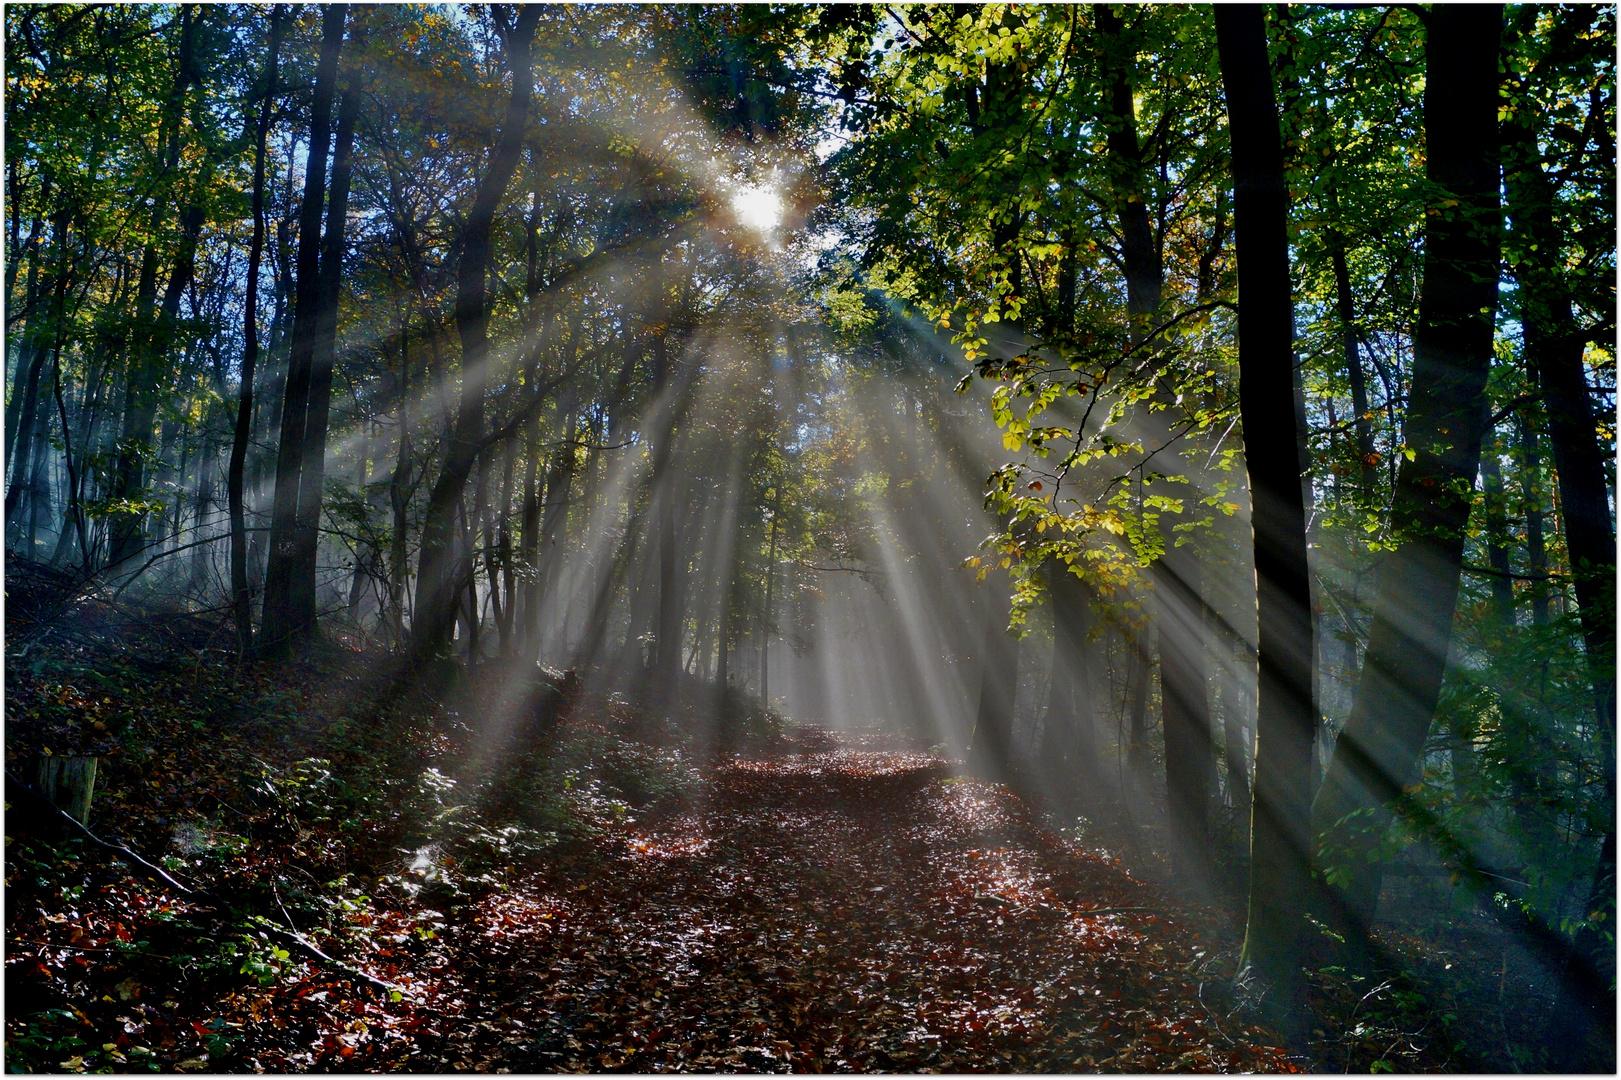 Herbstwald im Nebel.